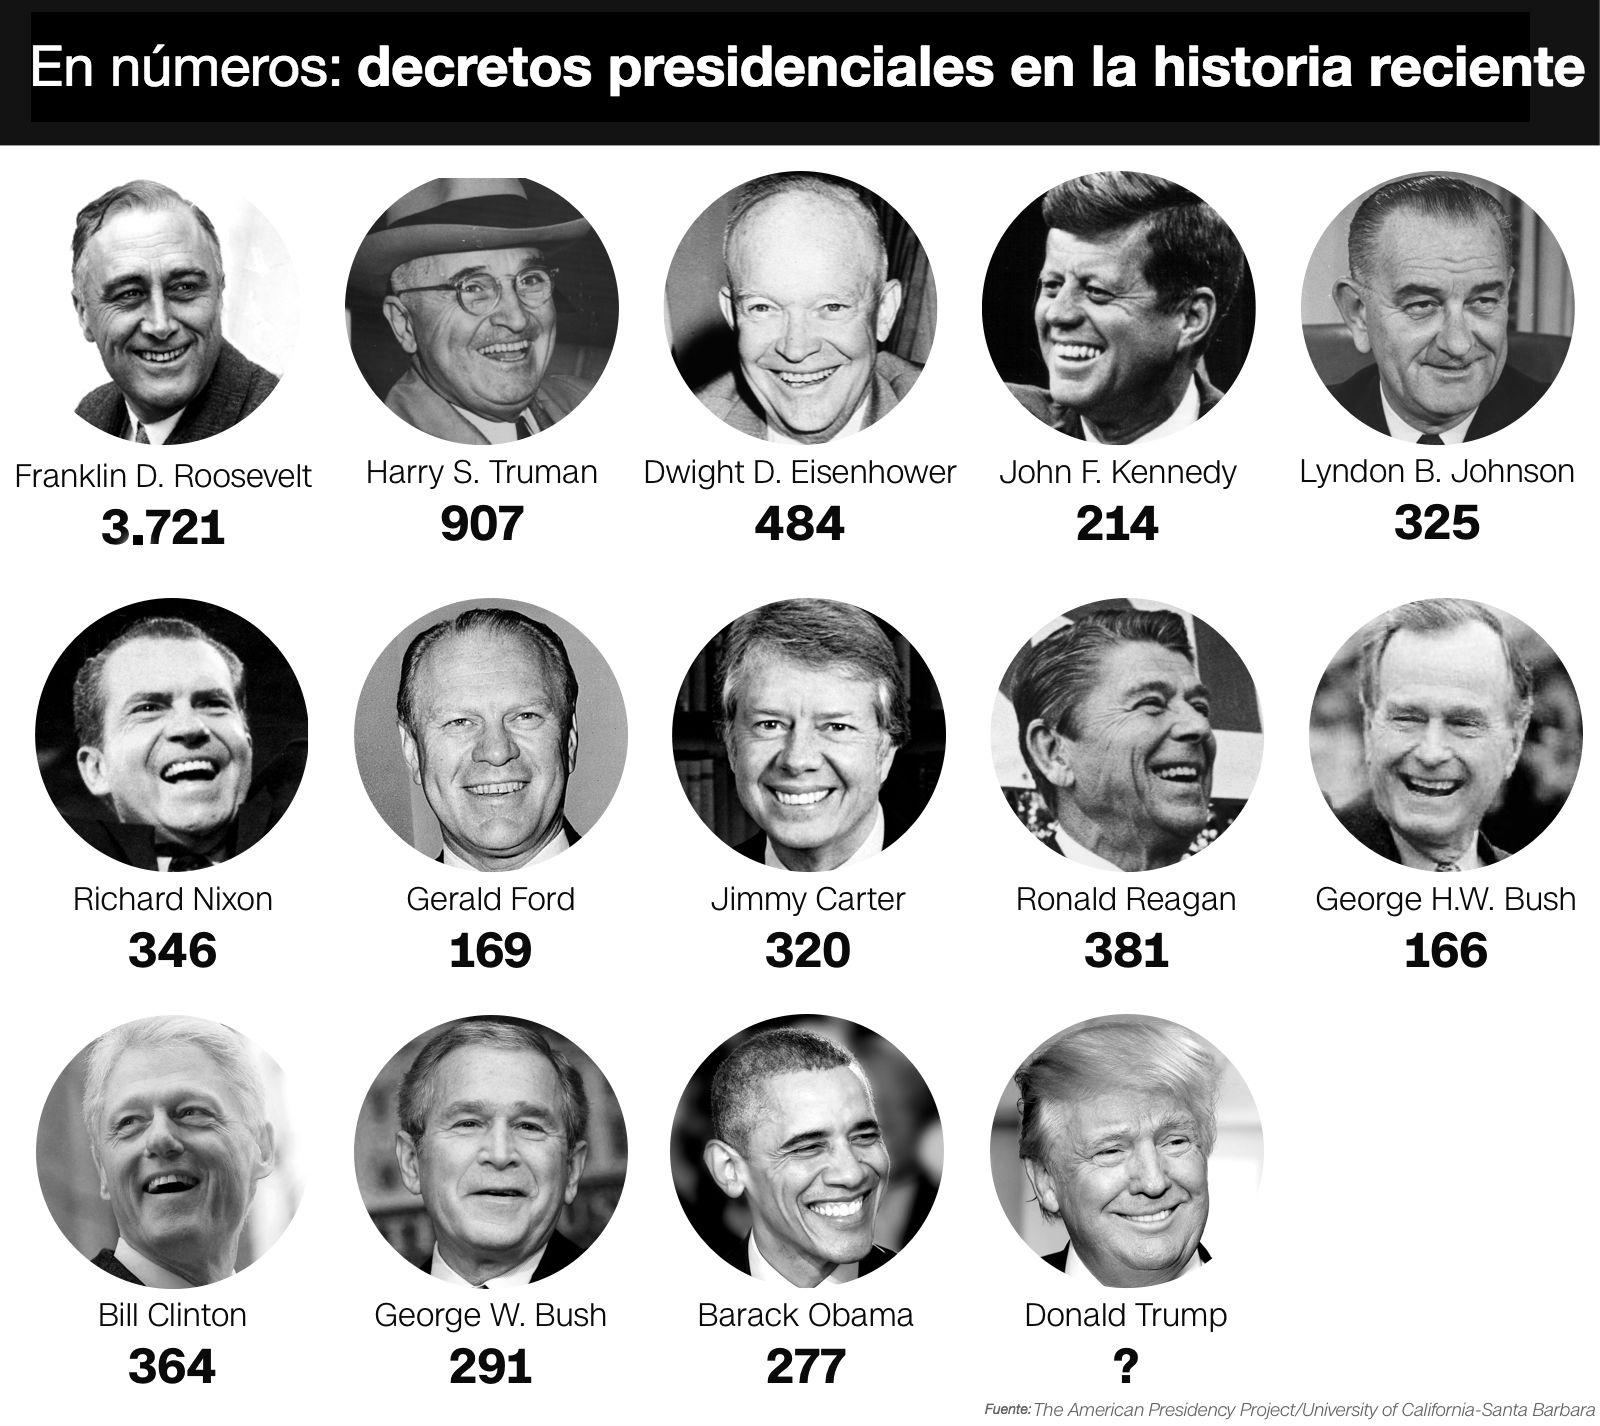 cuadro-decretos-presidentes